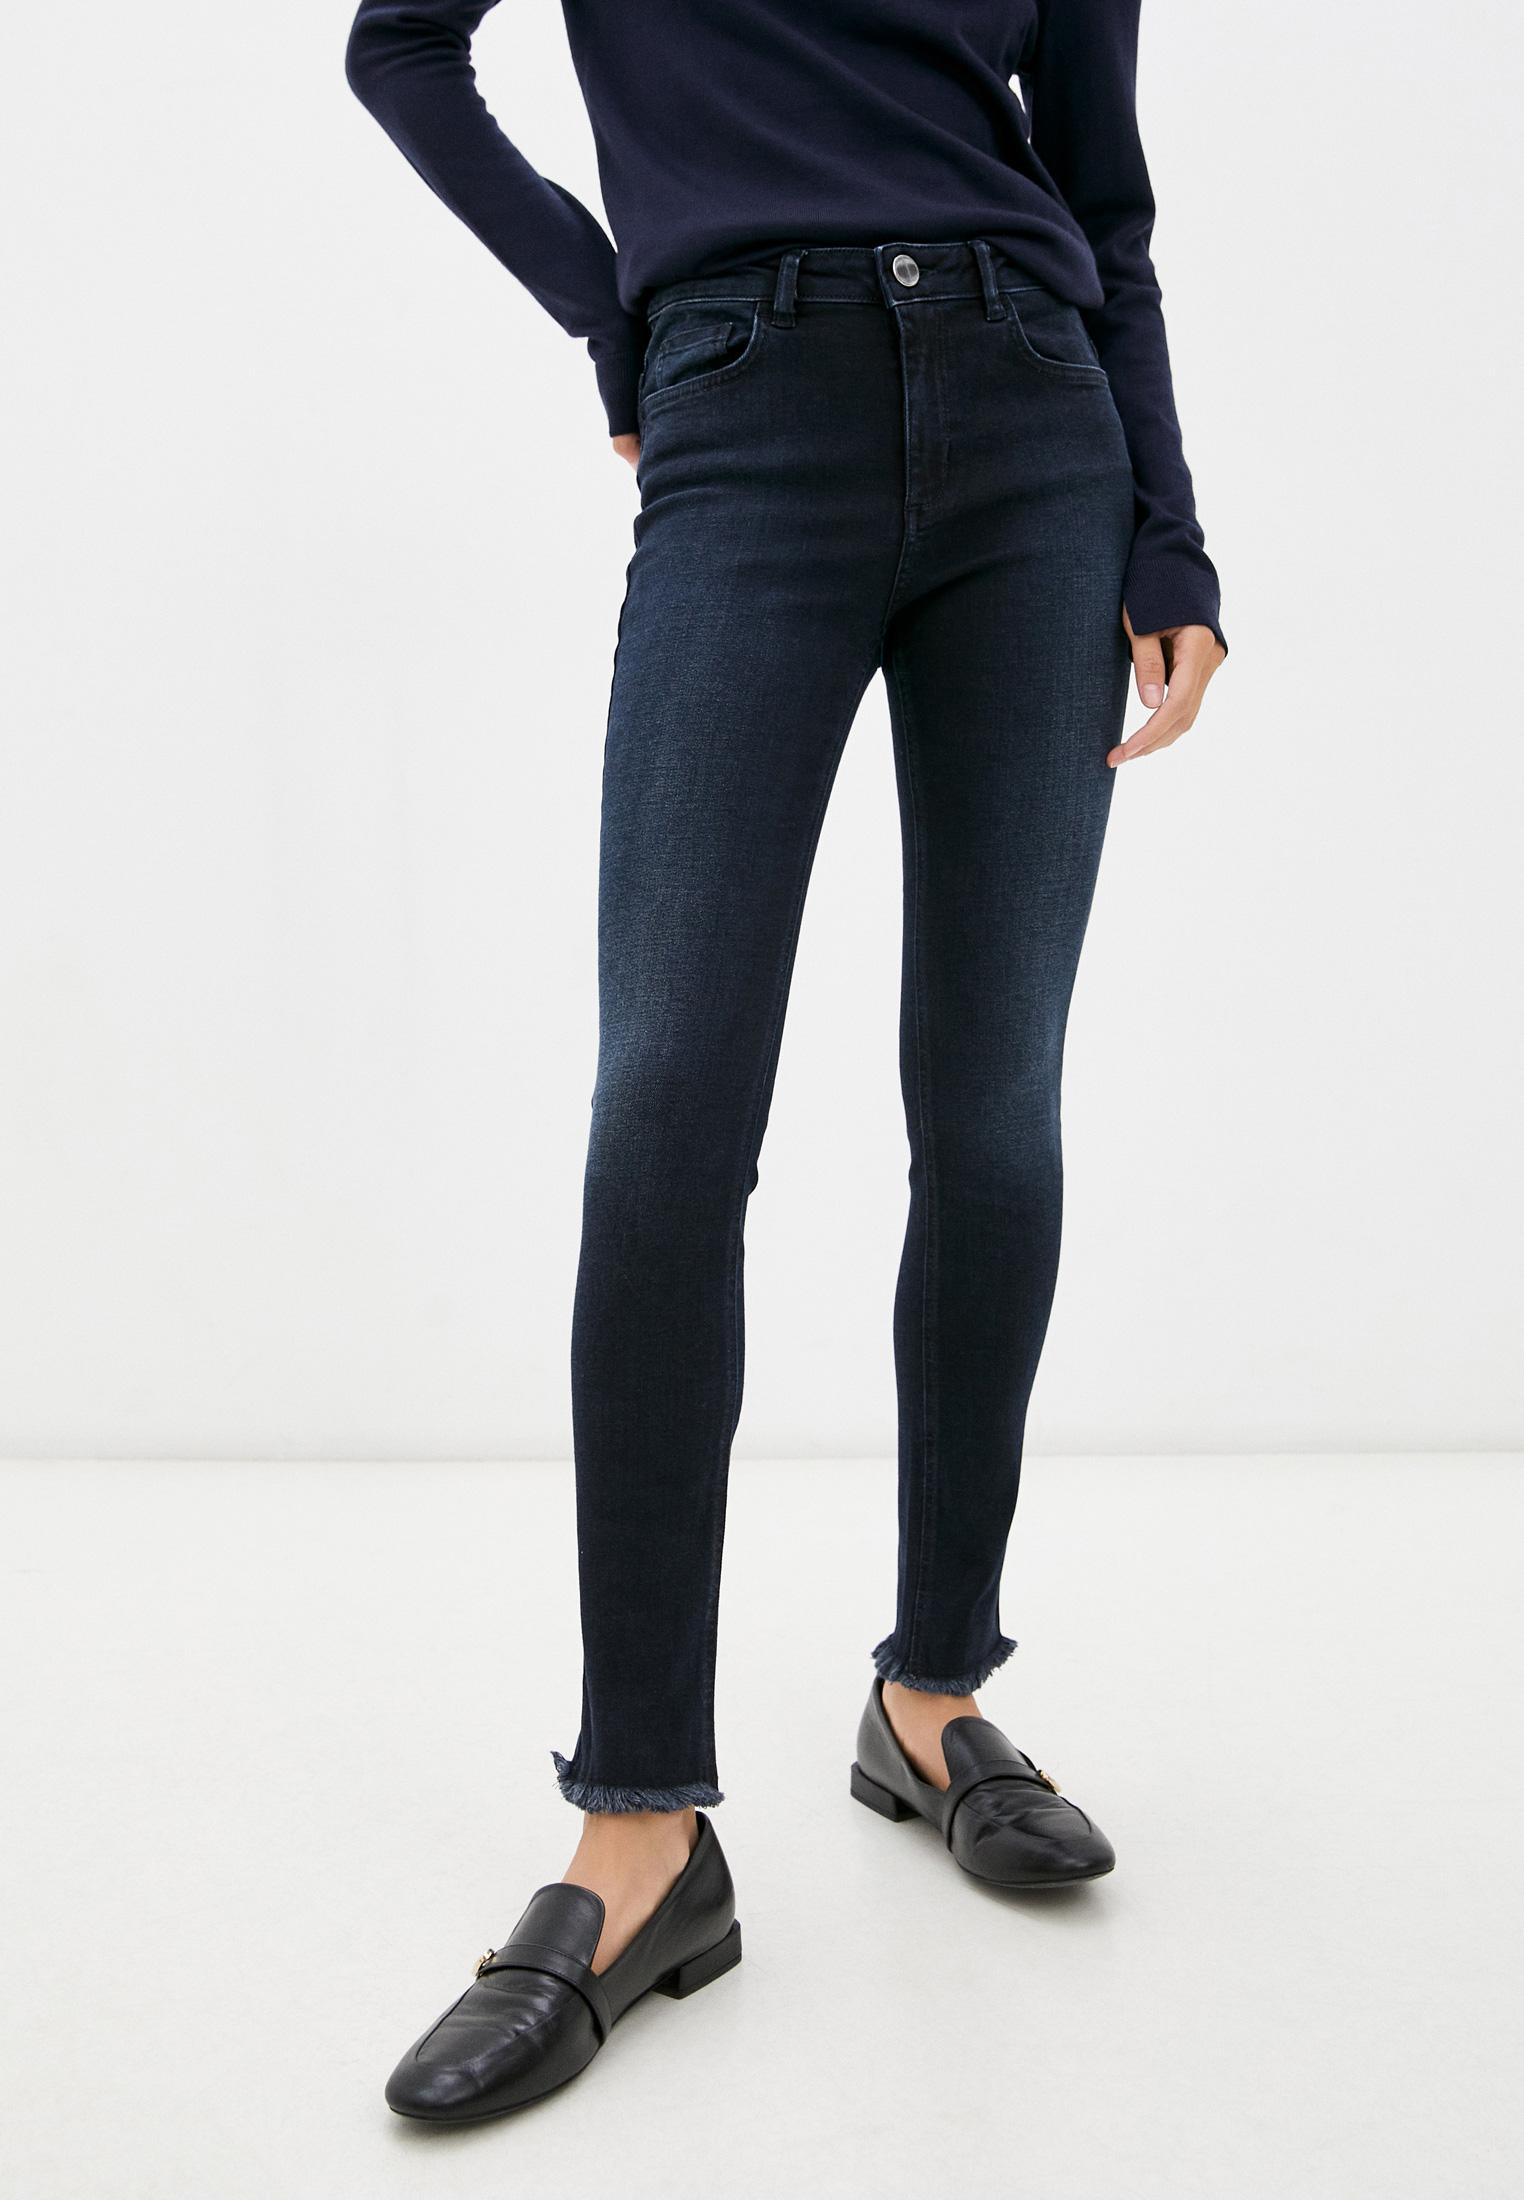 Зауженные джинсы Max Mara Leisure 31860116